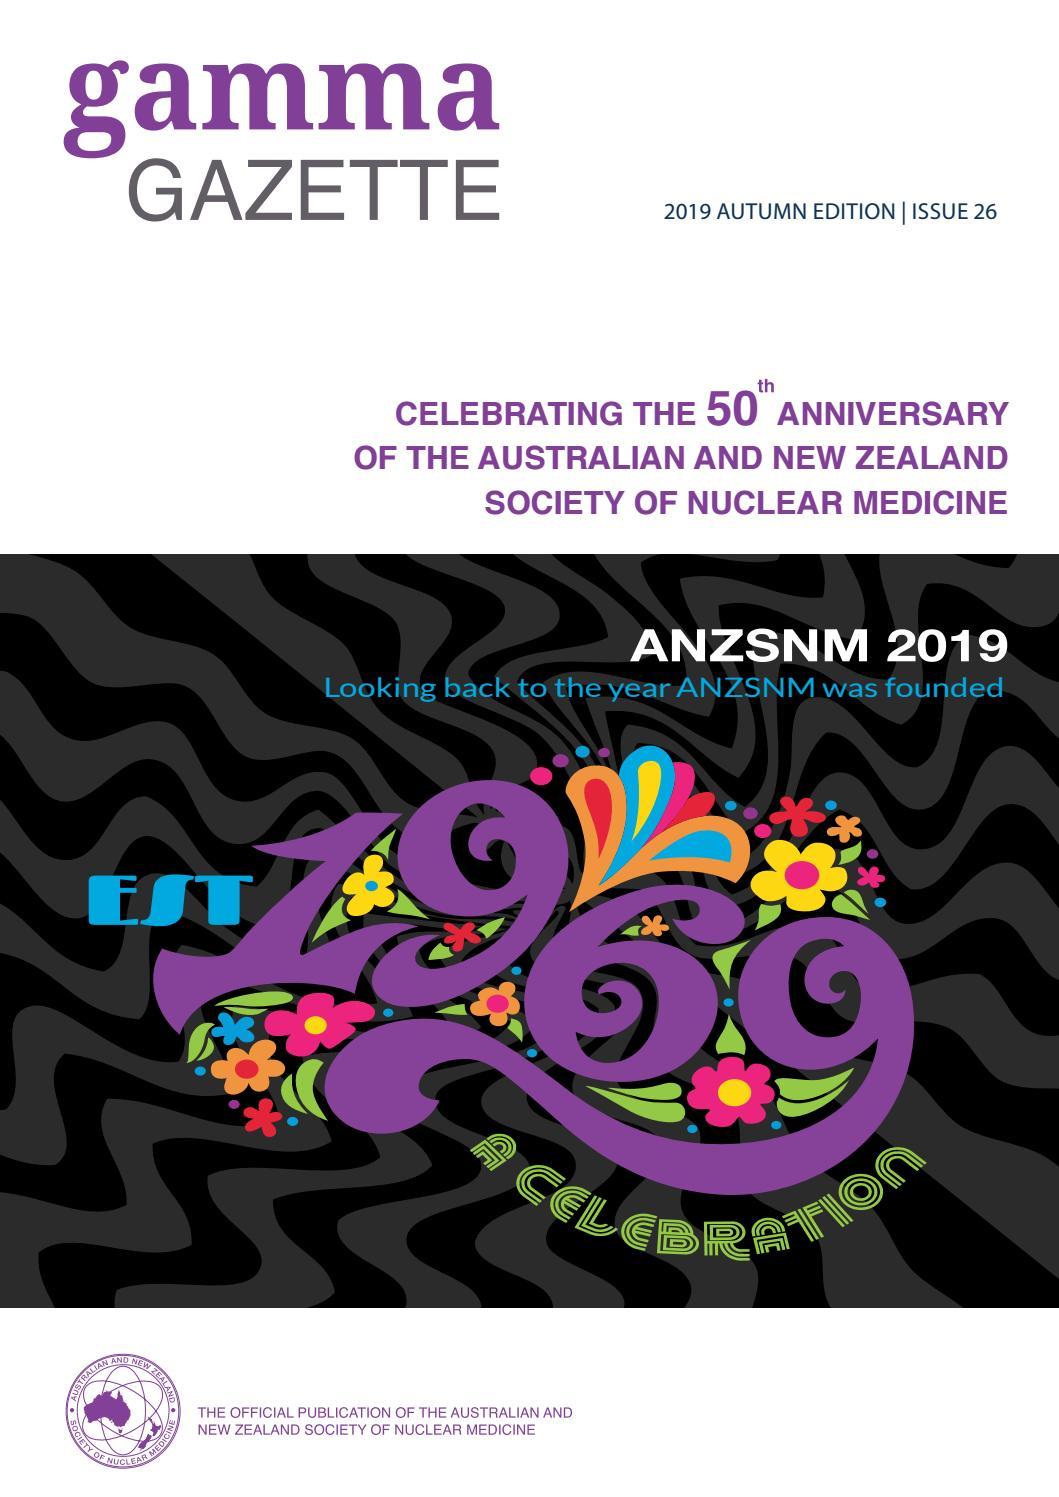 Gamma Gazette Autumn Edition 2019 by ANZSNM - issuu